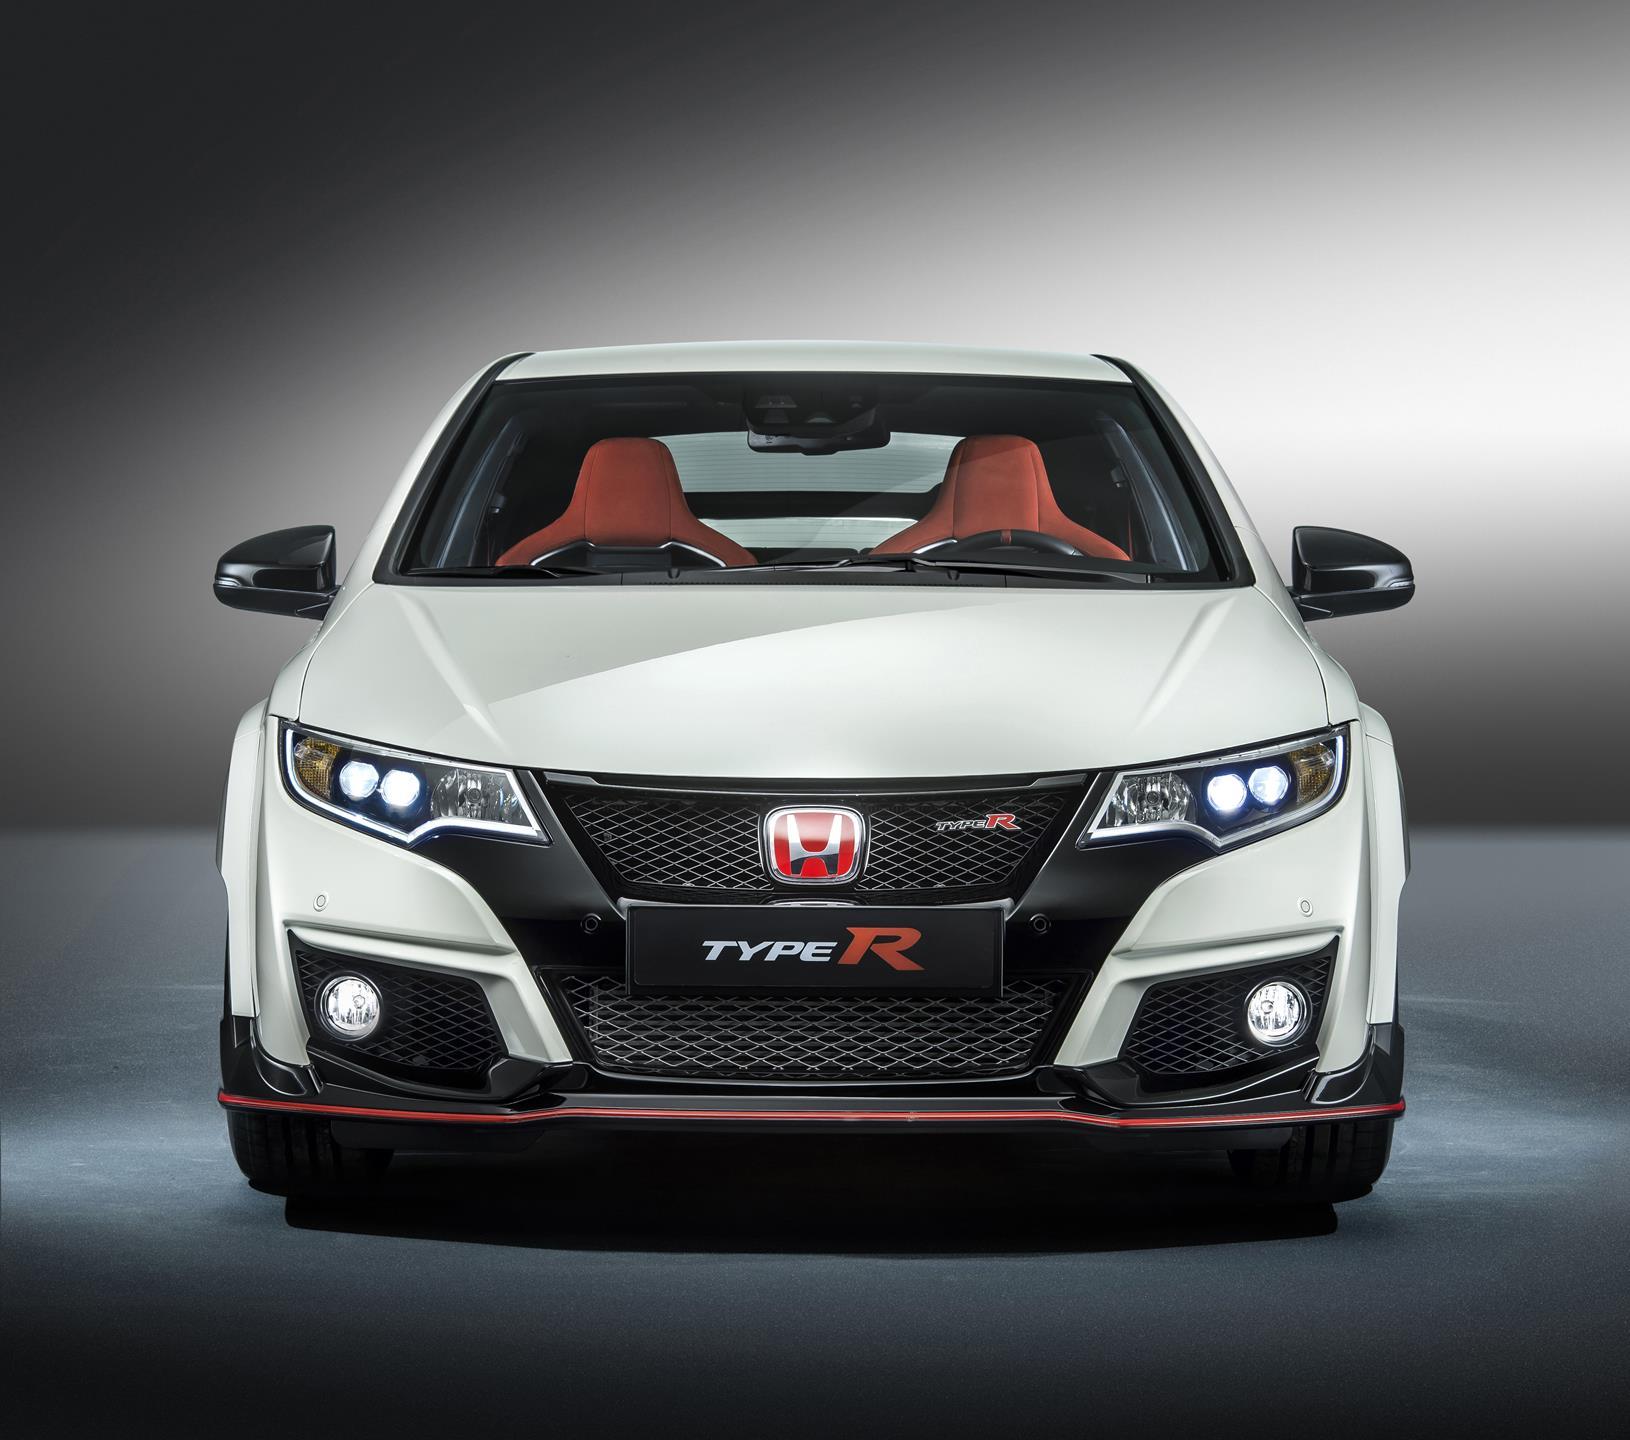 2015 Honda Civic Type R - conceptcarz.com